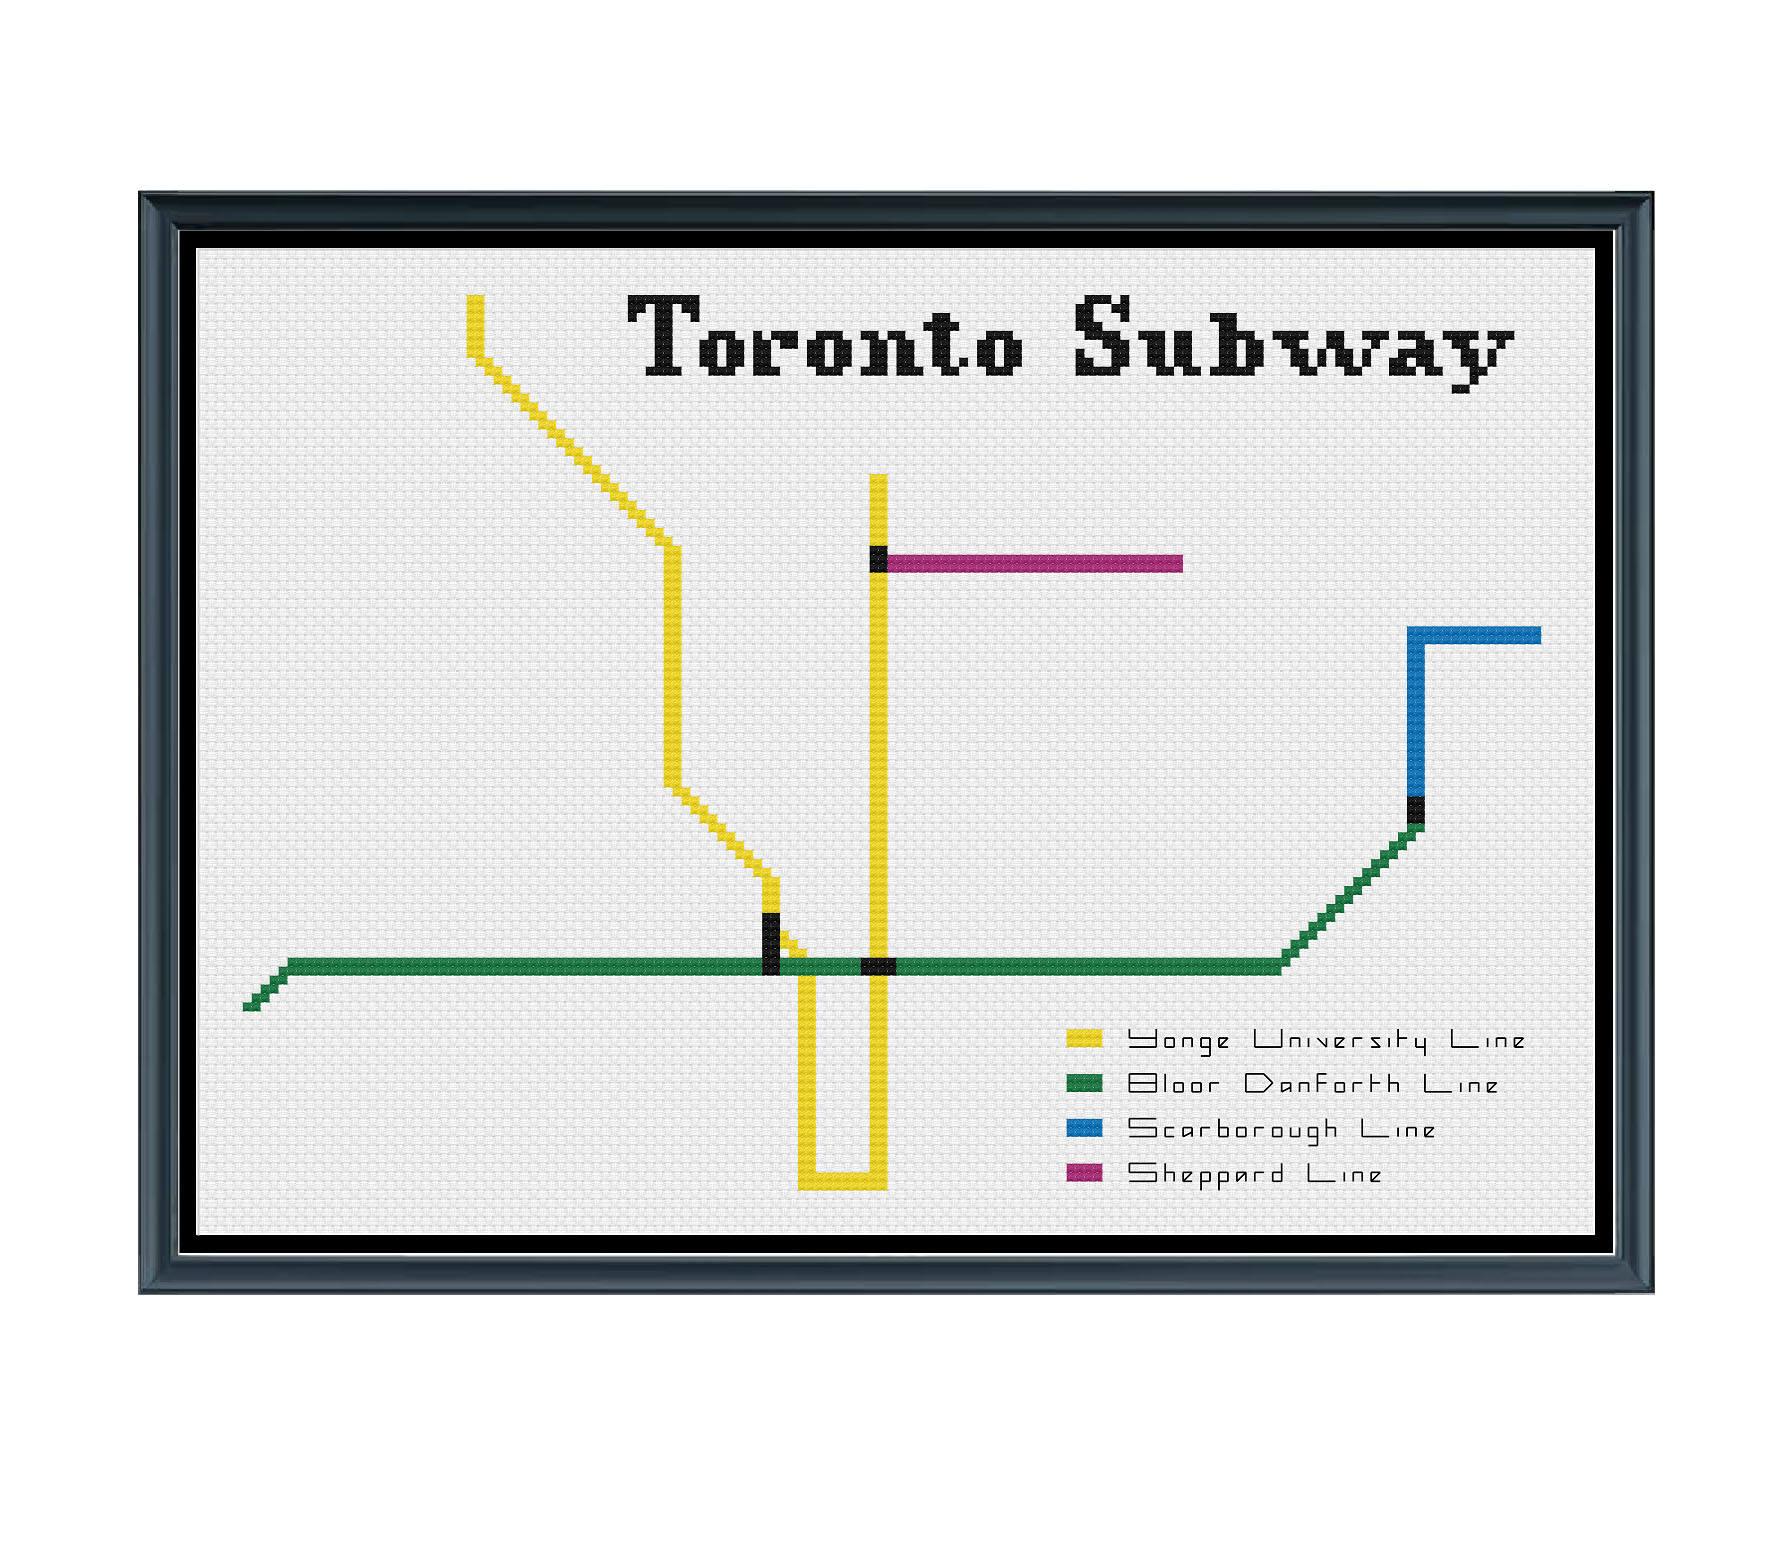 Toronto Subway Map Pdf.Toronto Subway Cross Stitch Pattern Subway Map Pattern Metro Map Pattern Home Decor Pattern Pdf Instant Download